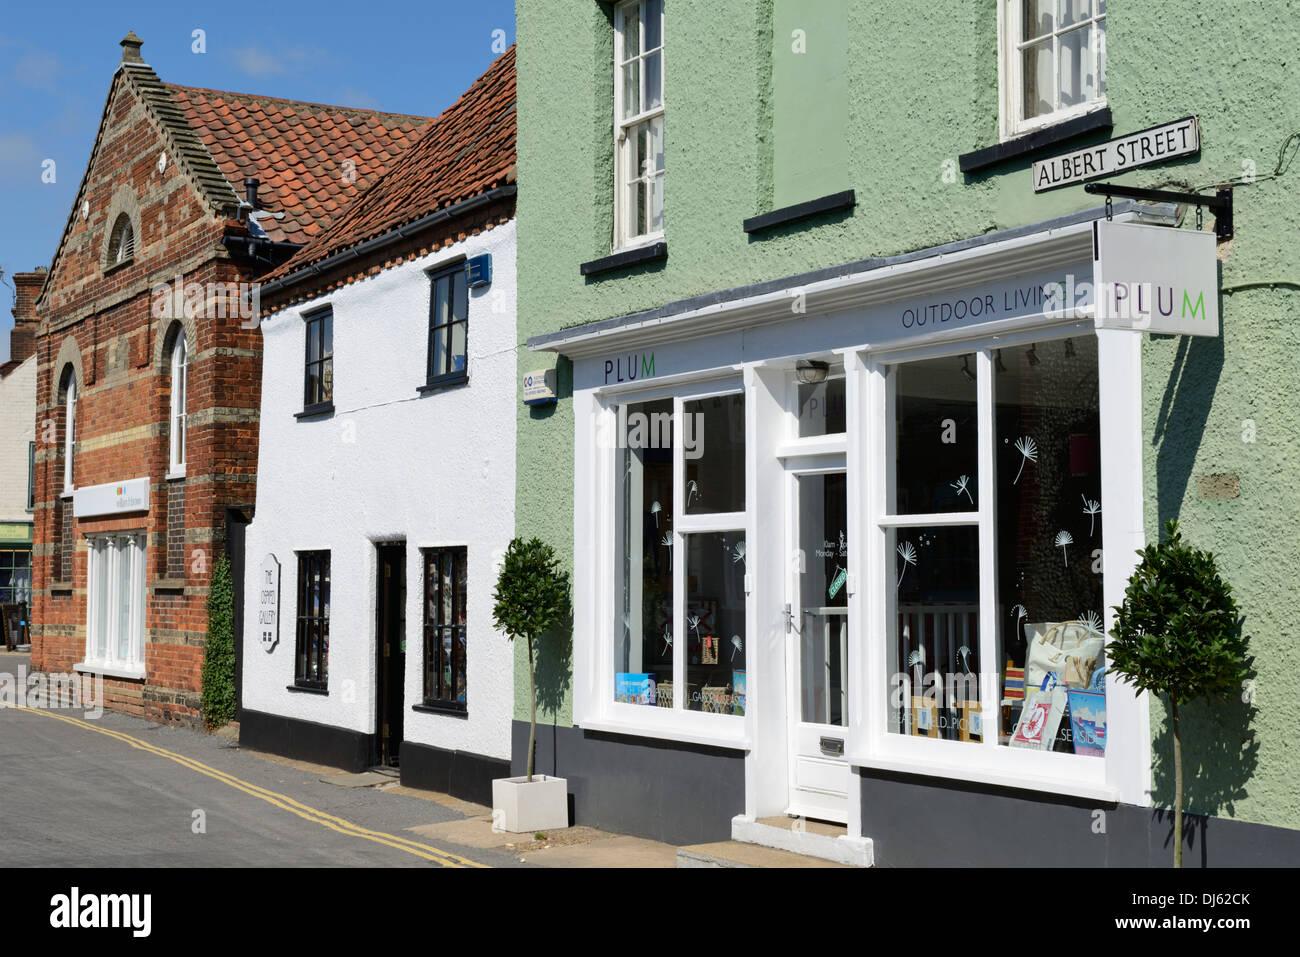 Attractive buildings on Albert Street, Holt, Norfolk, England, United Kingdom, UK, Europe - Stock Image